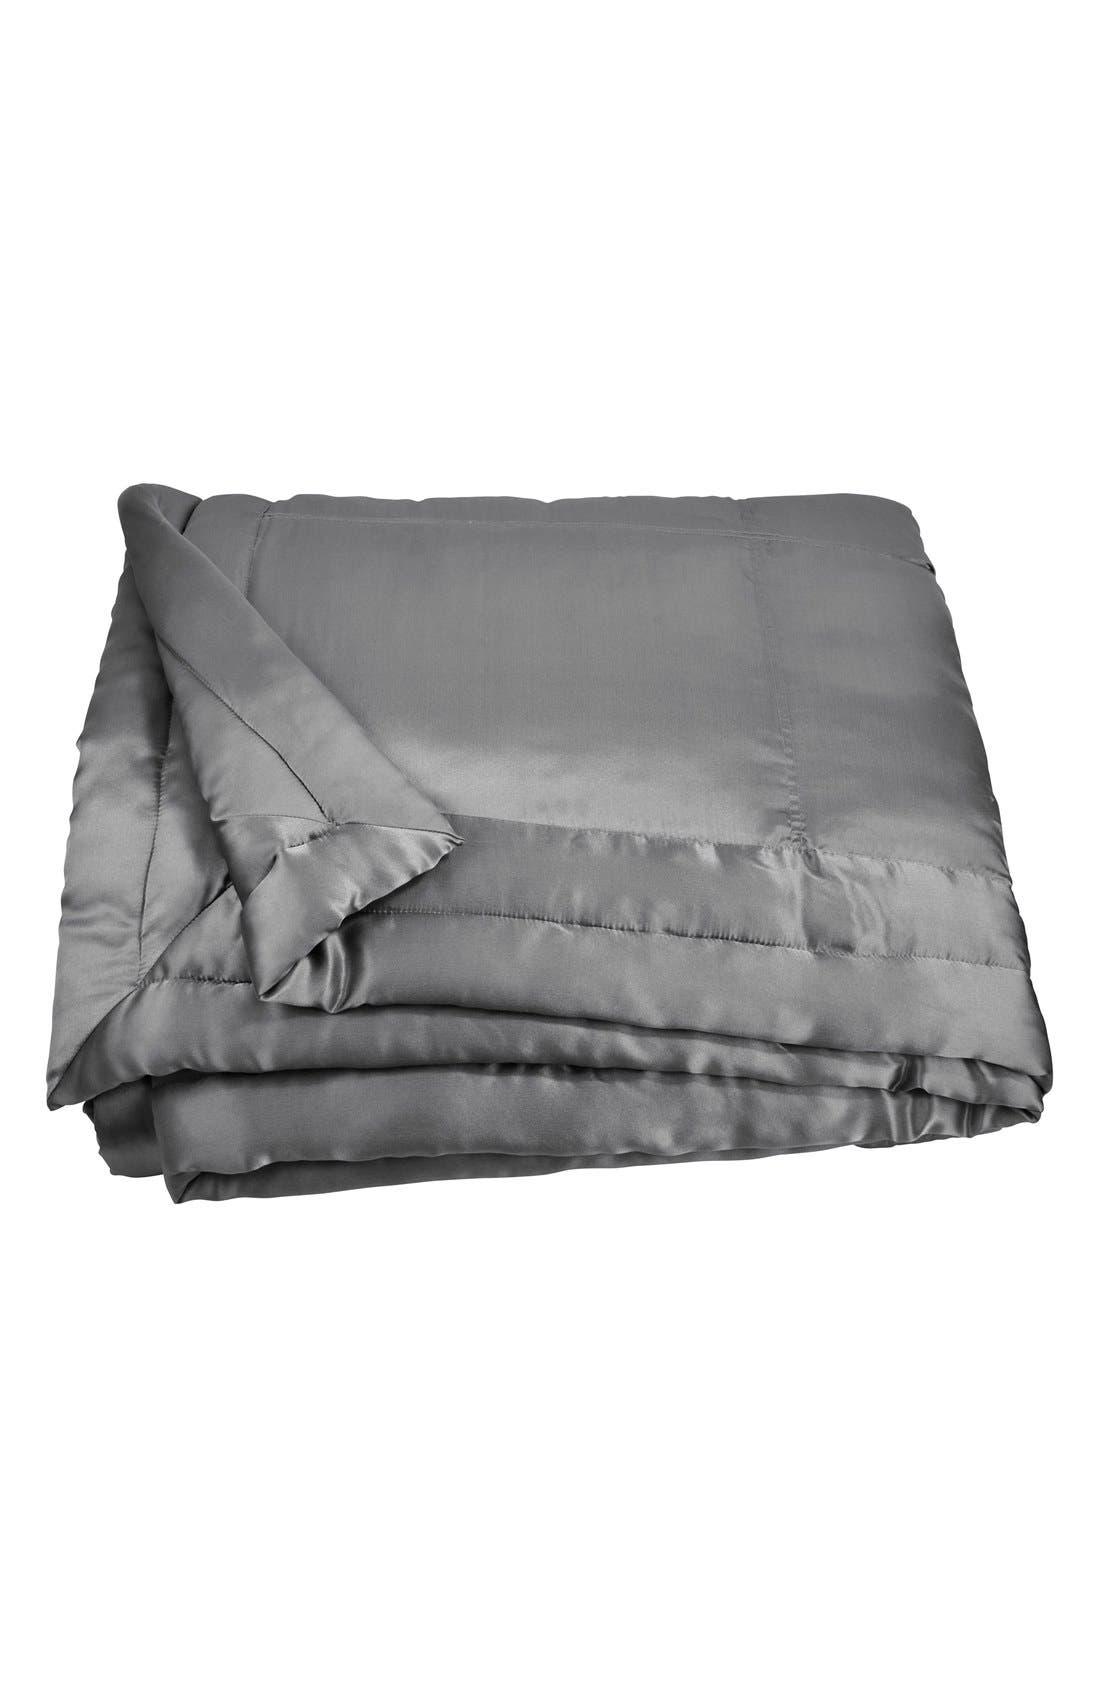 DONNA KARAN NEW YORK, Donna Karan Collection 'Surface' Silk Charmeuse Quilt, Alternate thumbnail 2, color, CHARCOAL